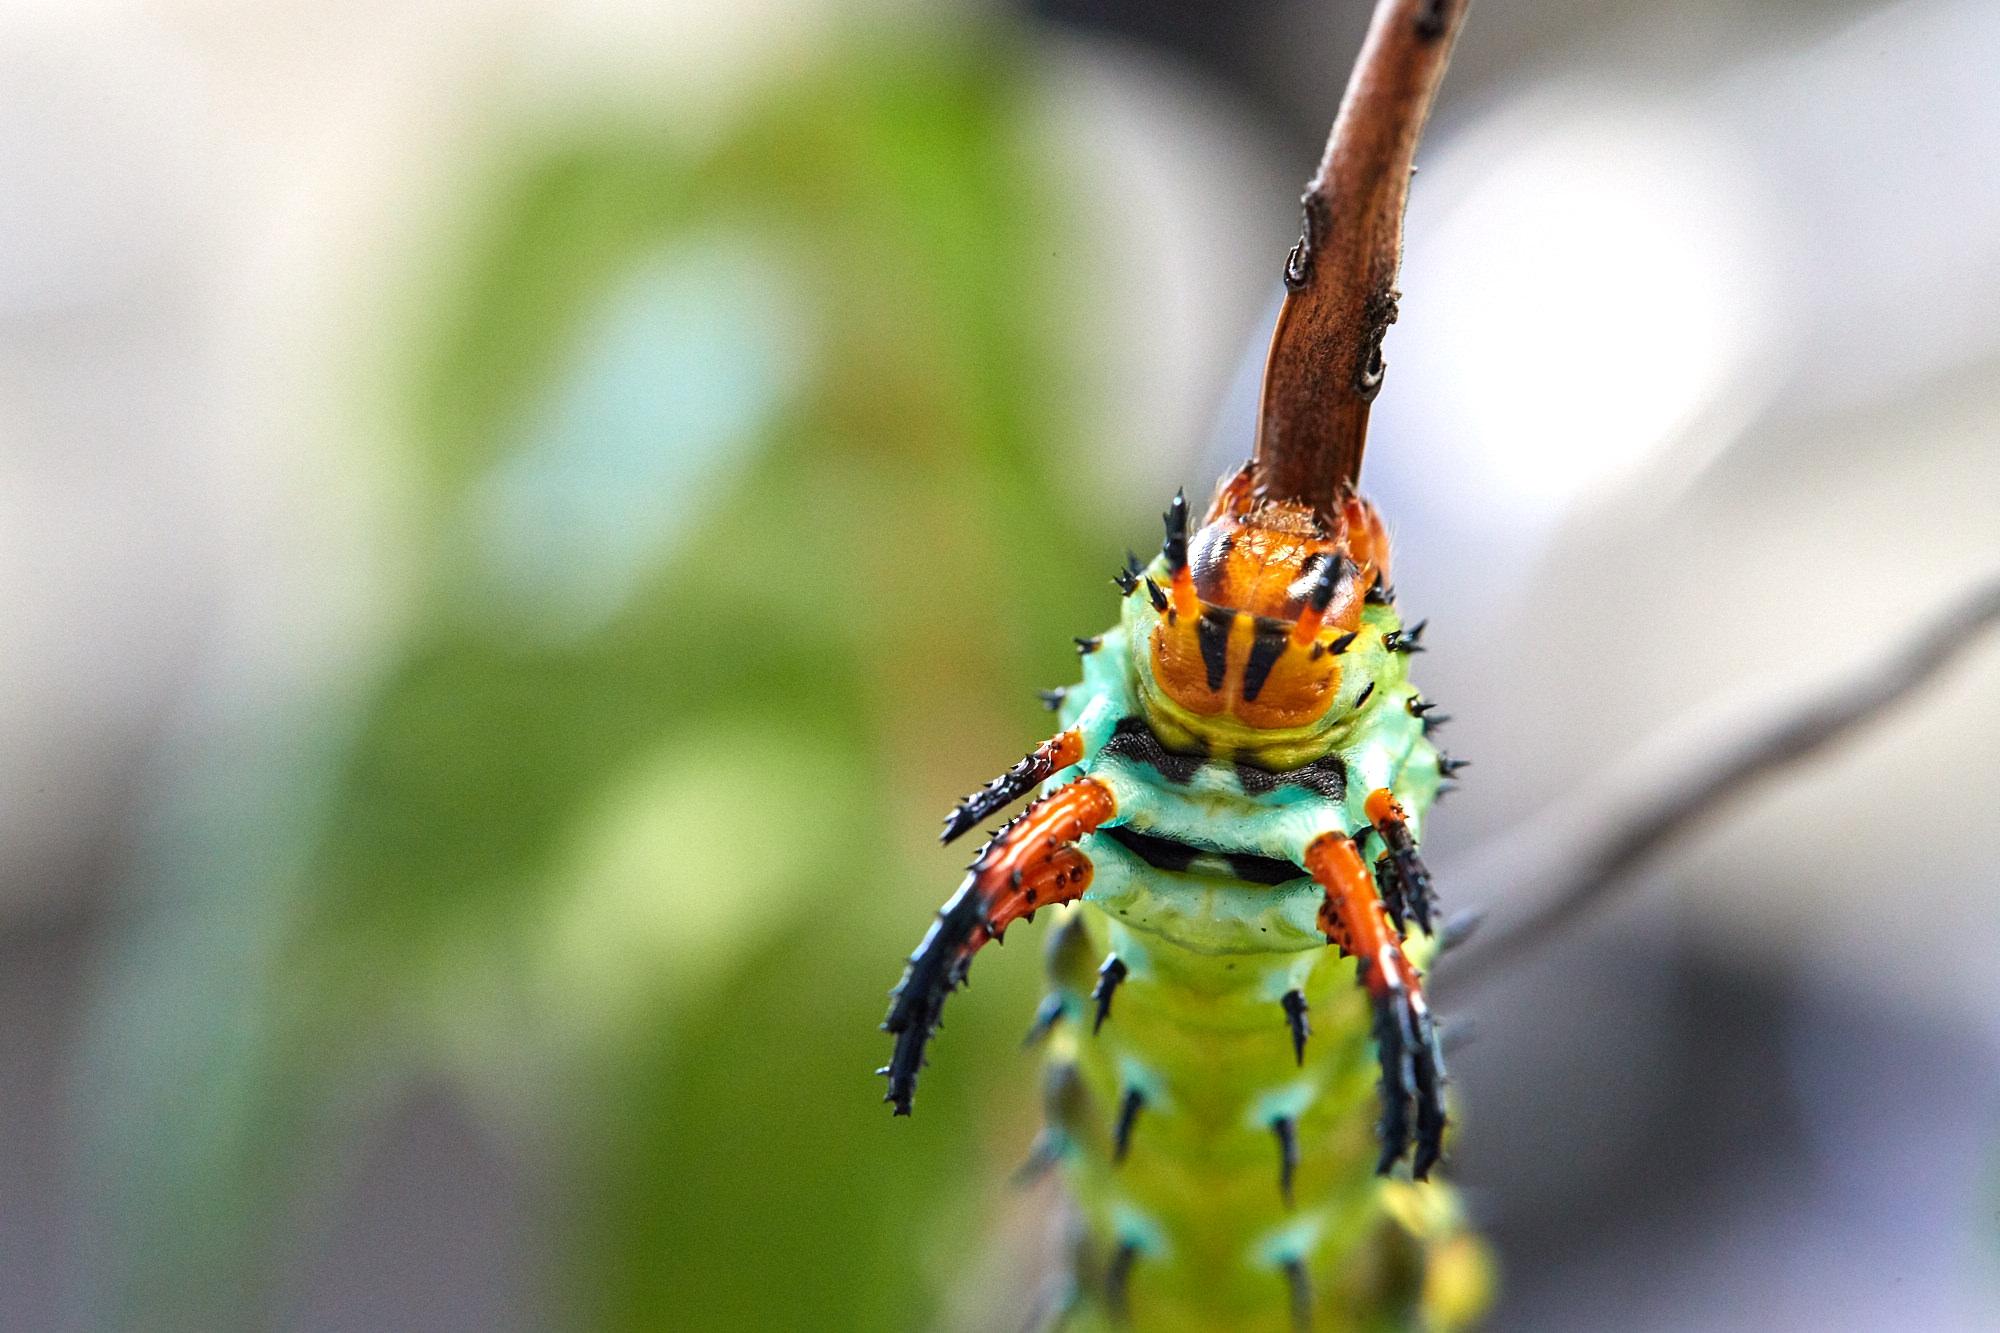 Caterpillars - 2016    - 40279- 000097.jpg